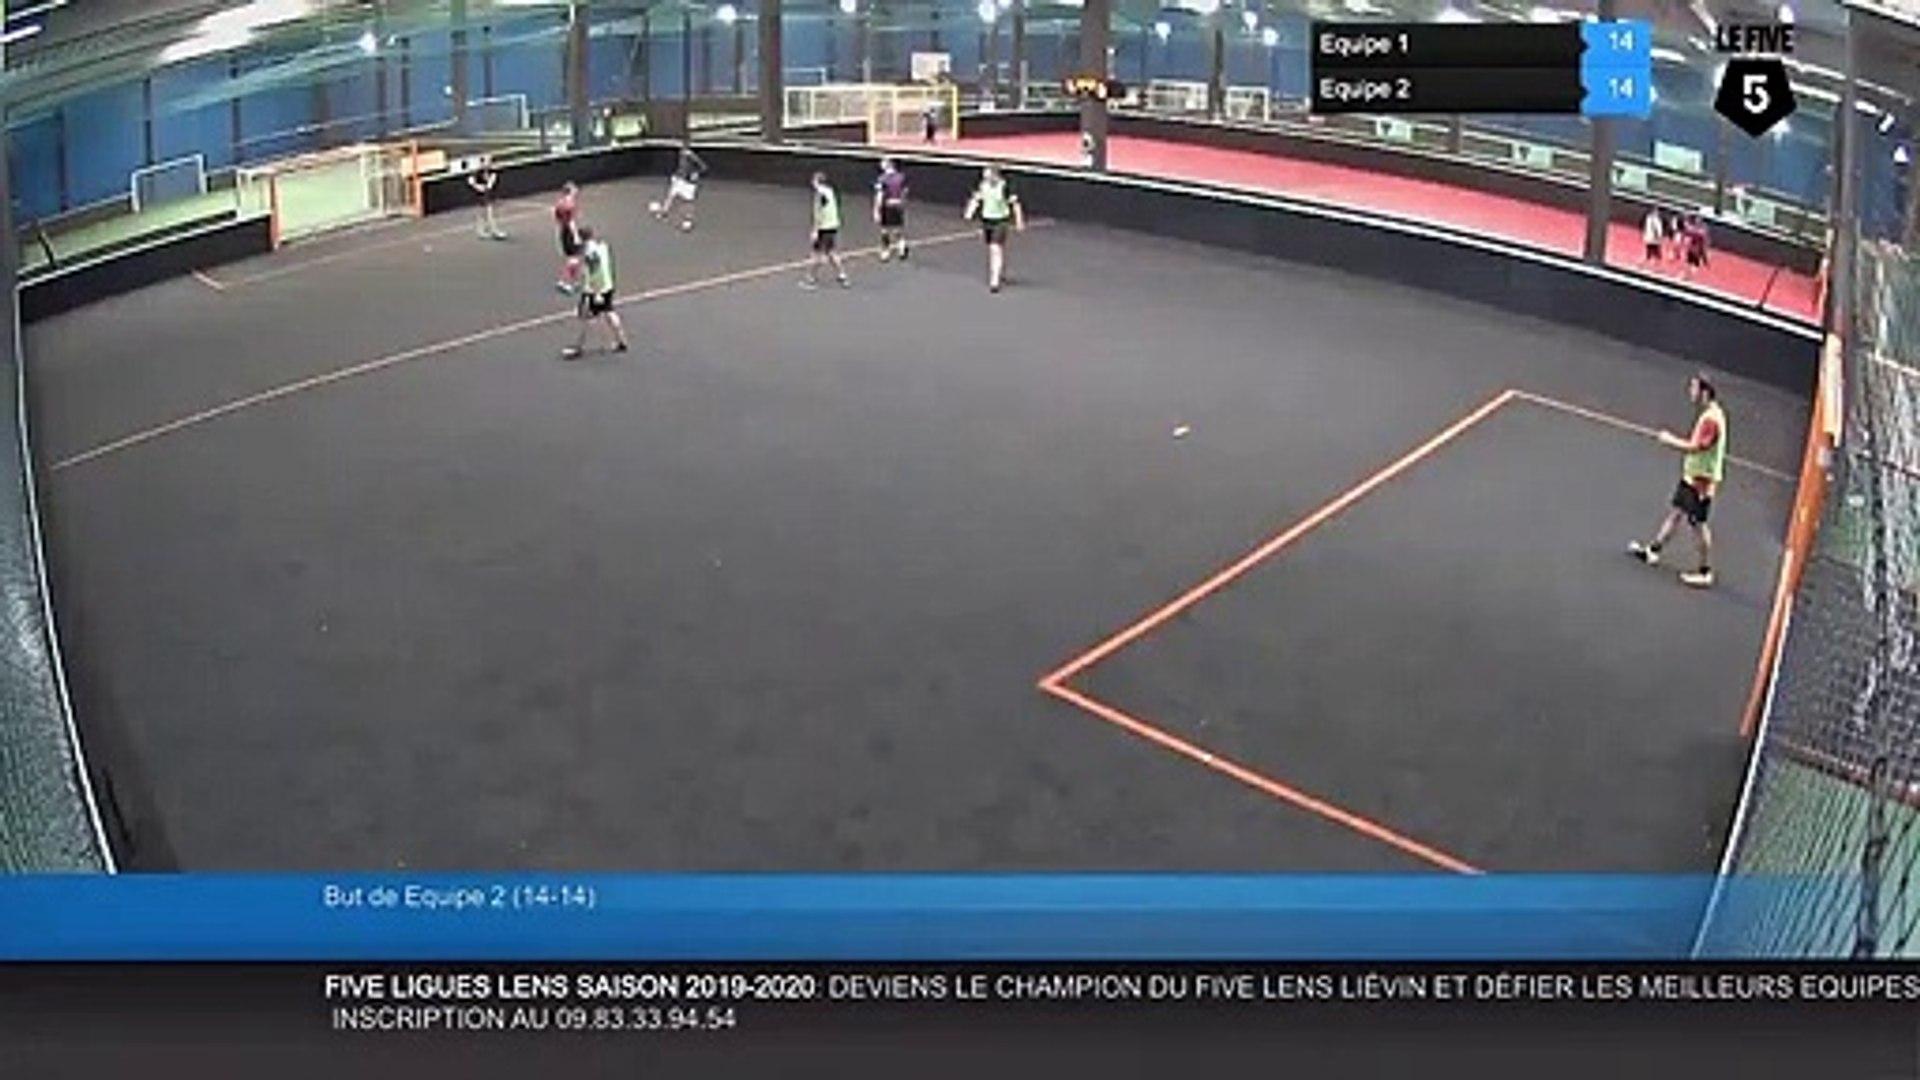 But de Equipe 2 (14-14) - Equipe 1 Vs Equipe 2 - 03/08/19 14:34 - Loisir Lens (LeFive)